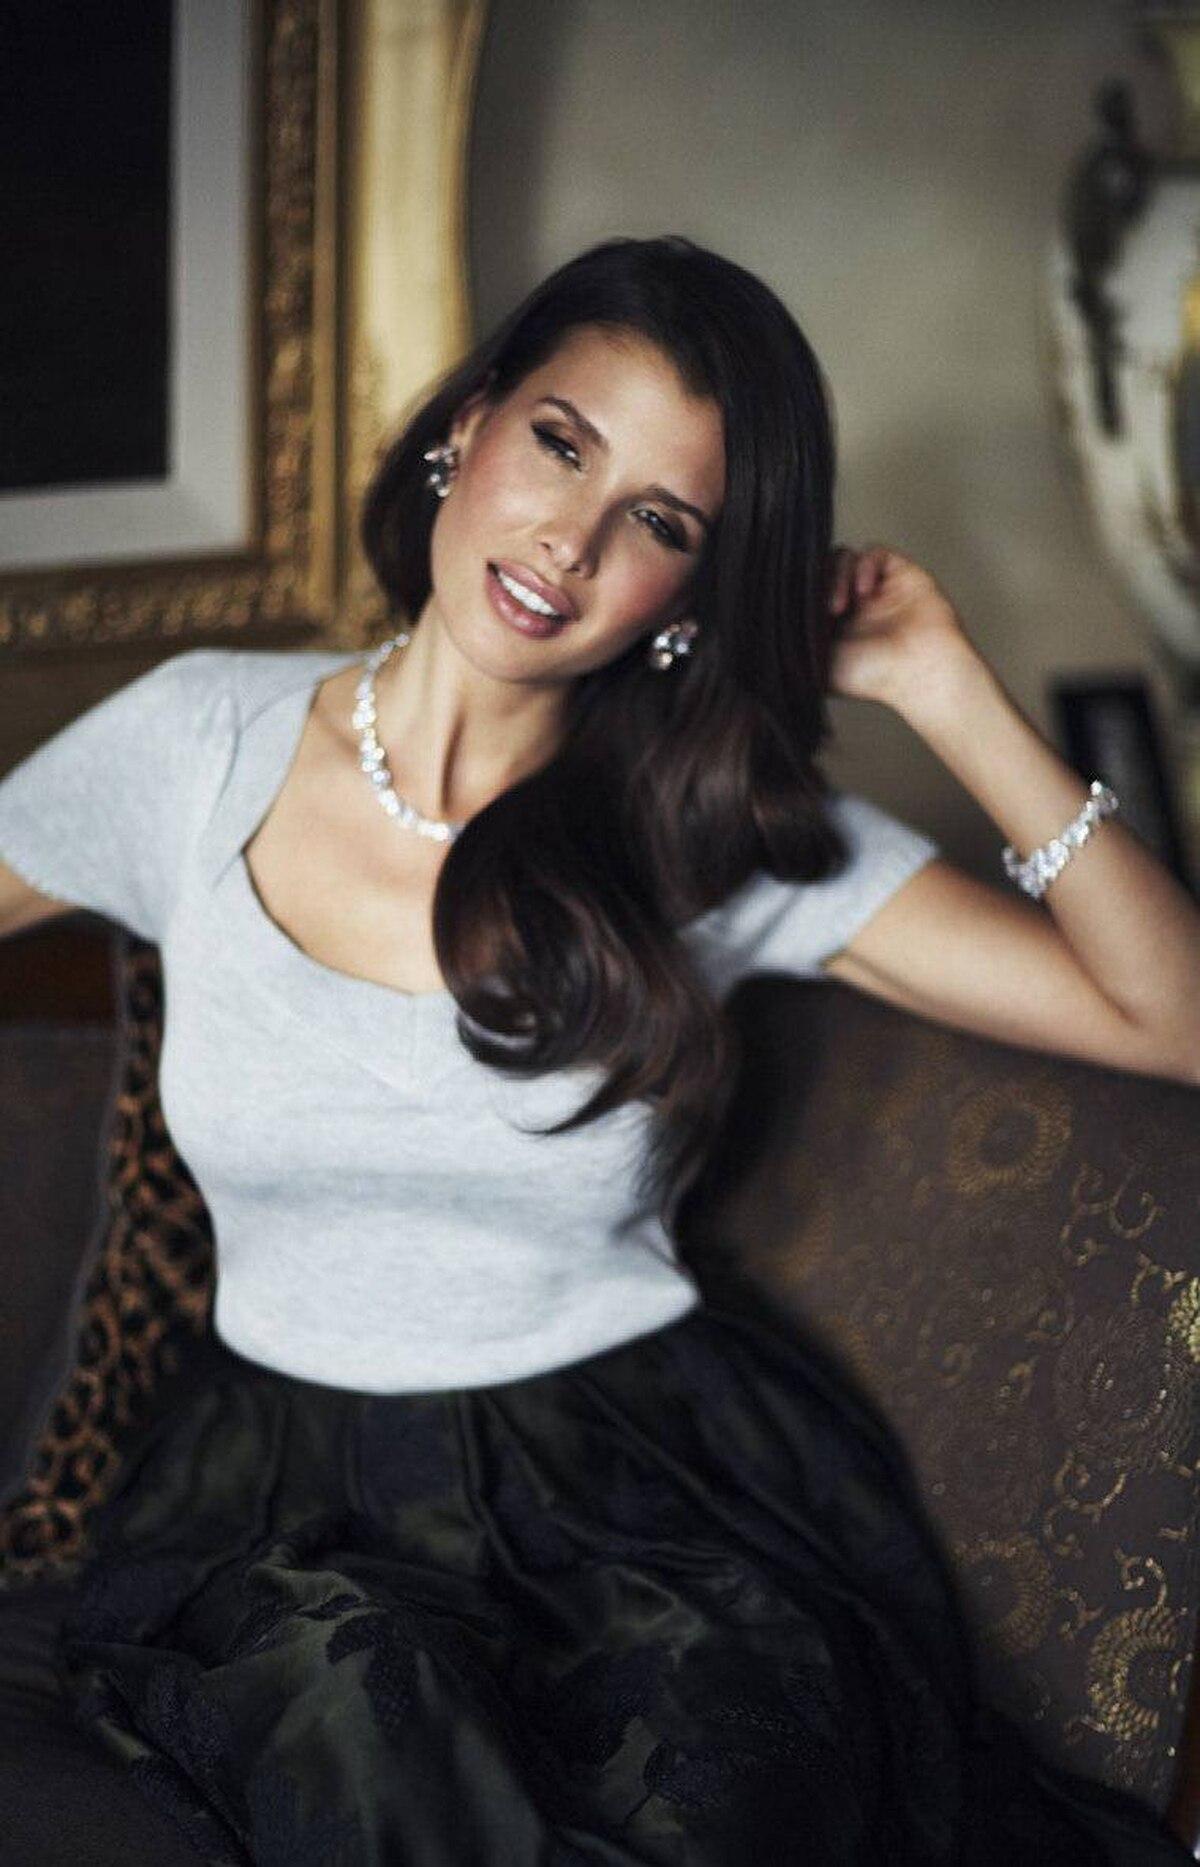 INTIMATE APPAREL Rachel Rachel Roy top, $69 at the Bay. Dries Van Noten skirt, $2,350 at Holt Renfrew. Lia Sophia earrings, $143. Kenneth Jay Lane necklace, $385, bracelet, $495 at Holt Renfrew.